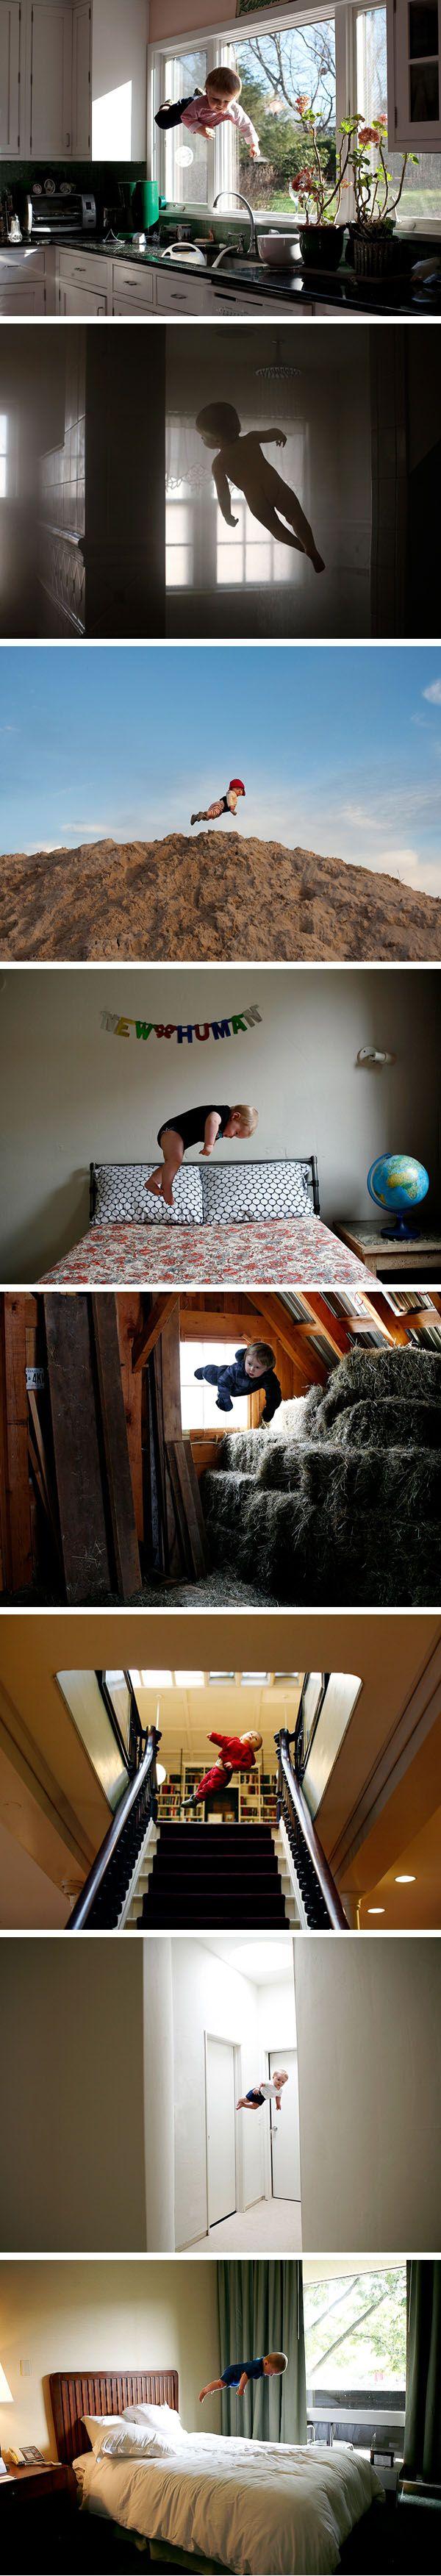 (WOW) Rachel Hulin's amazing baby levitation photos